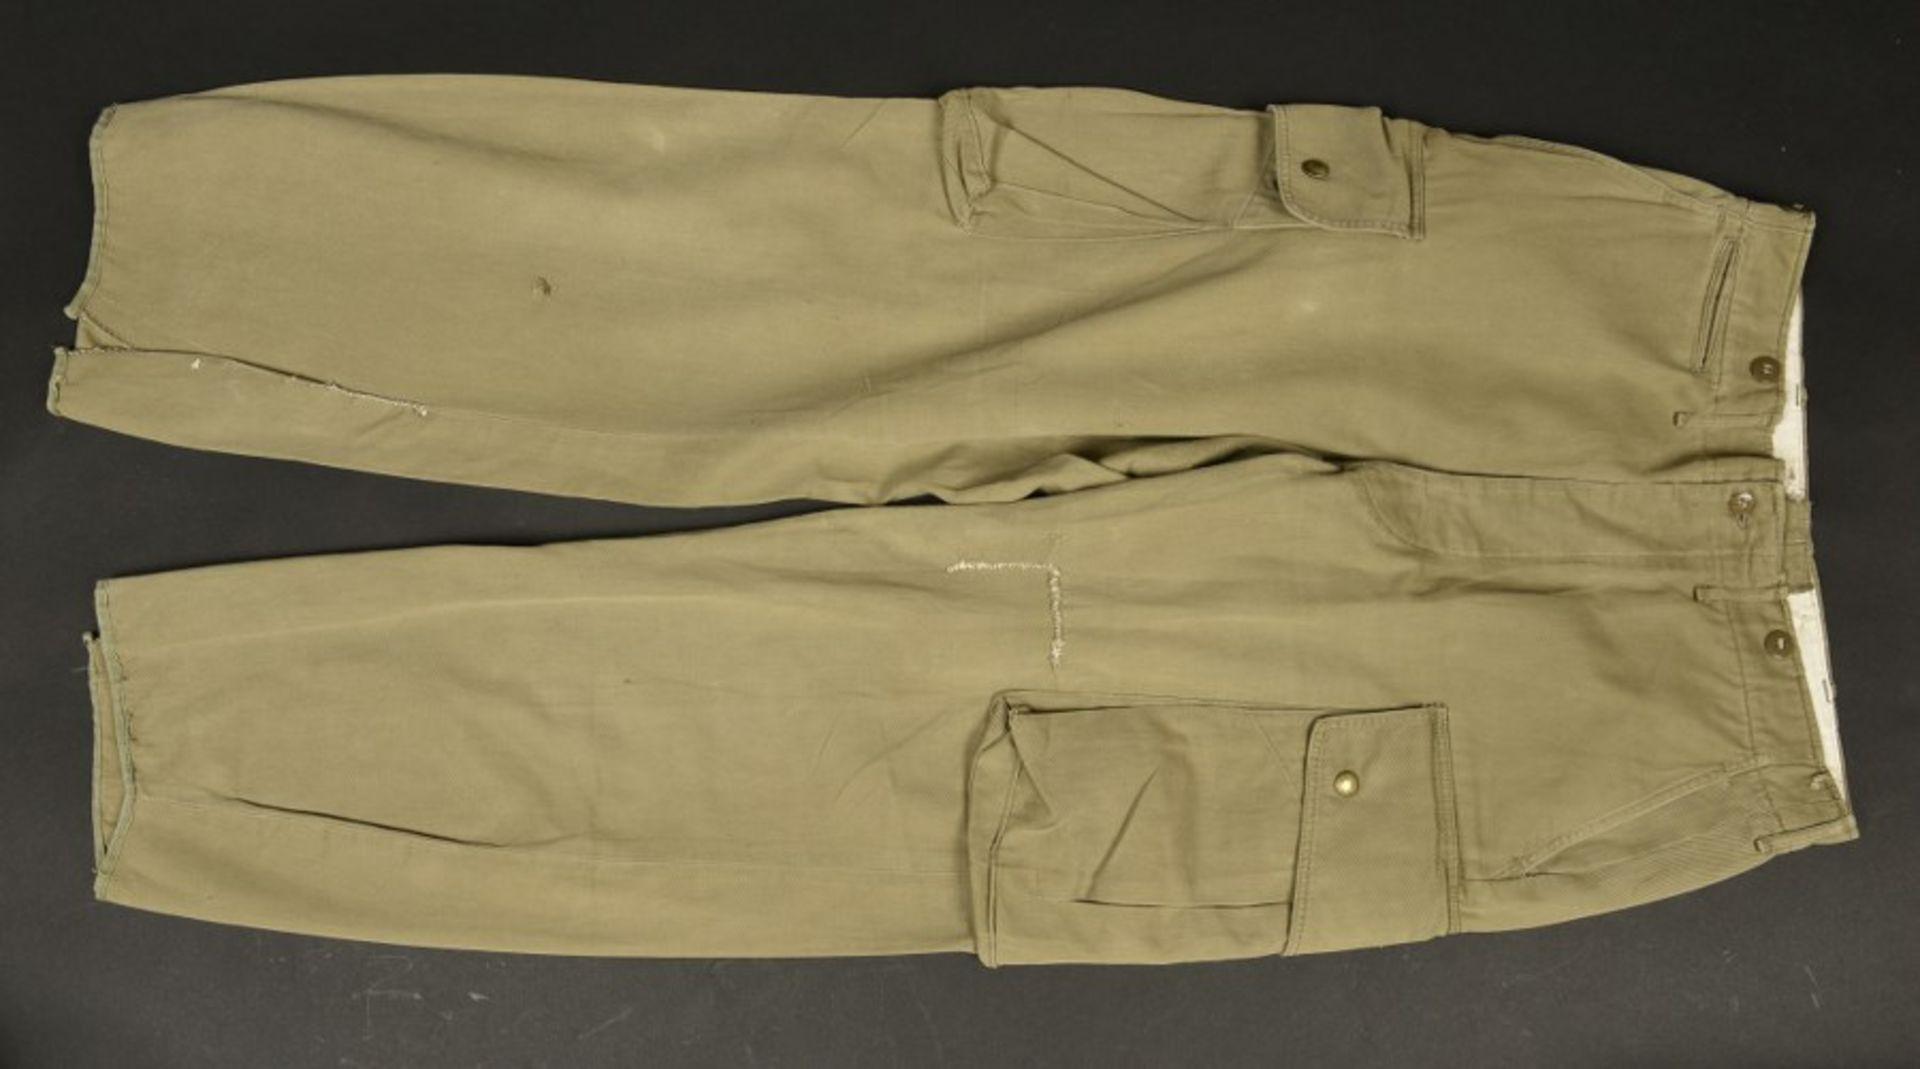 Pantalon du parachutiste américain B Orsborn. Pants of American paratrooper B OrsbornEn popeline,